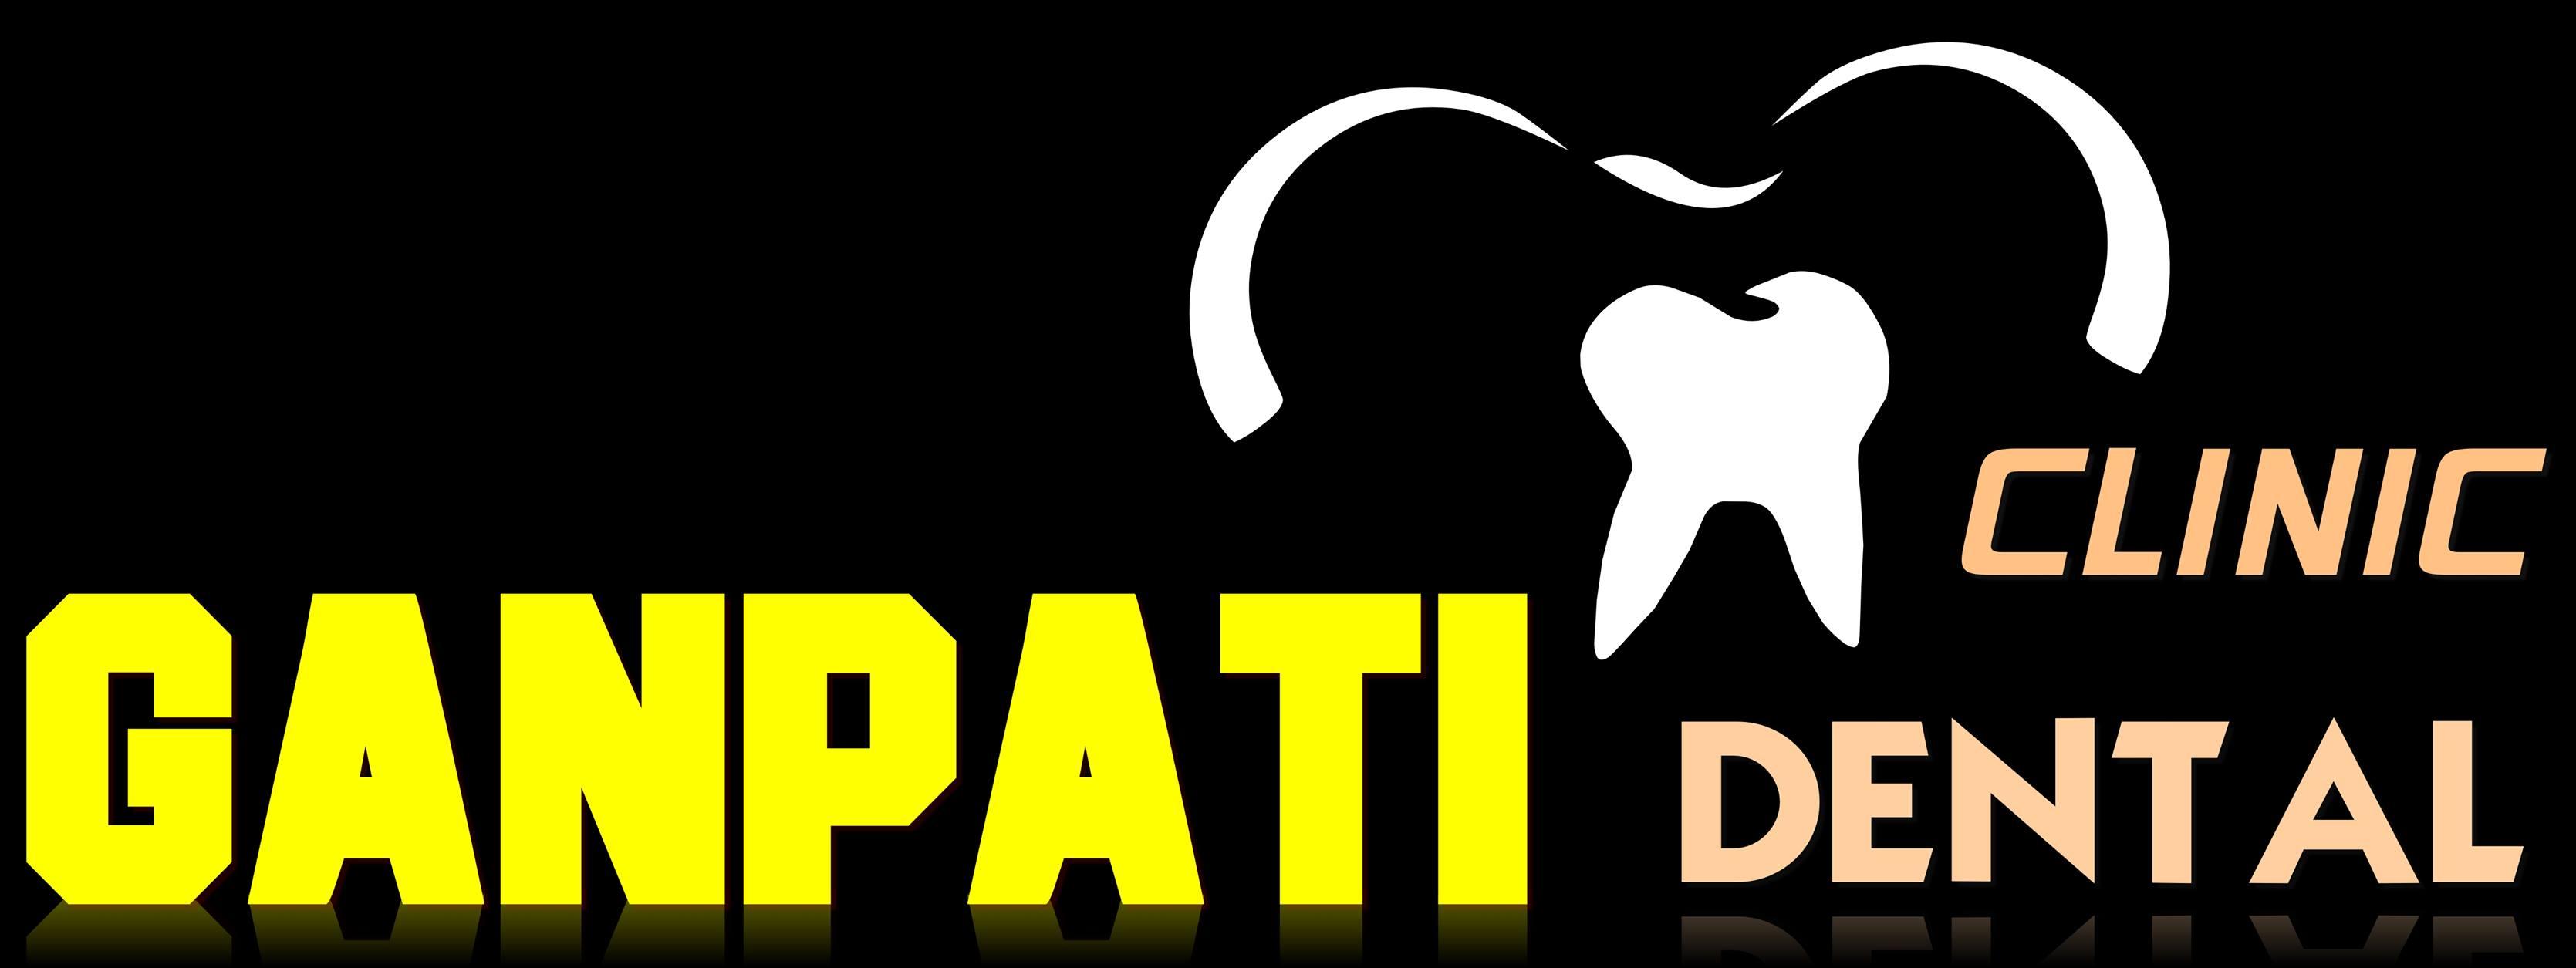 Ganpati Dental Clinic & Implant Center